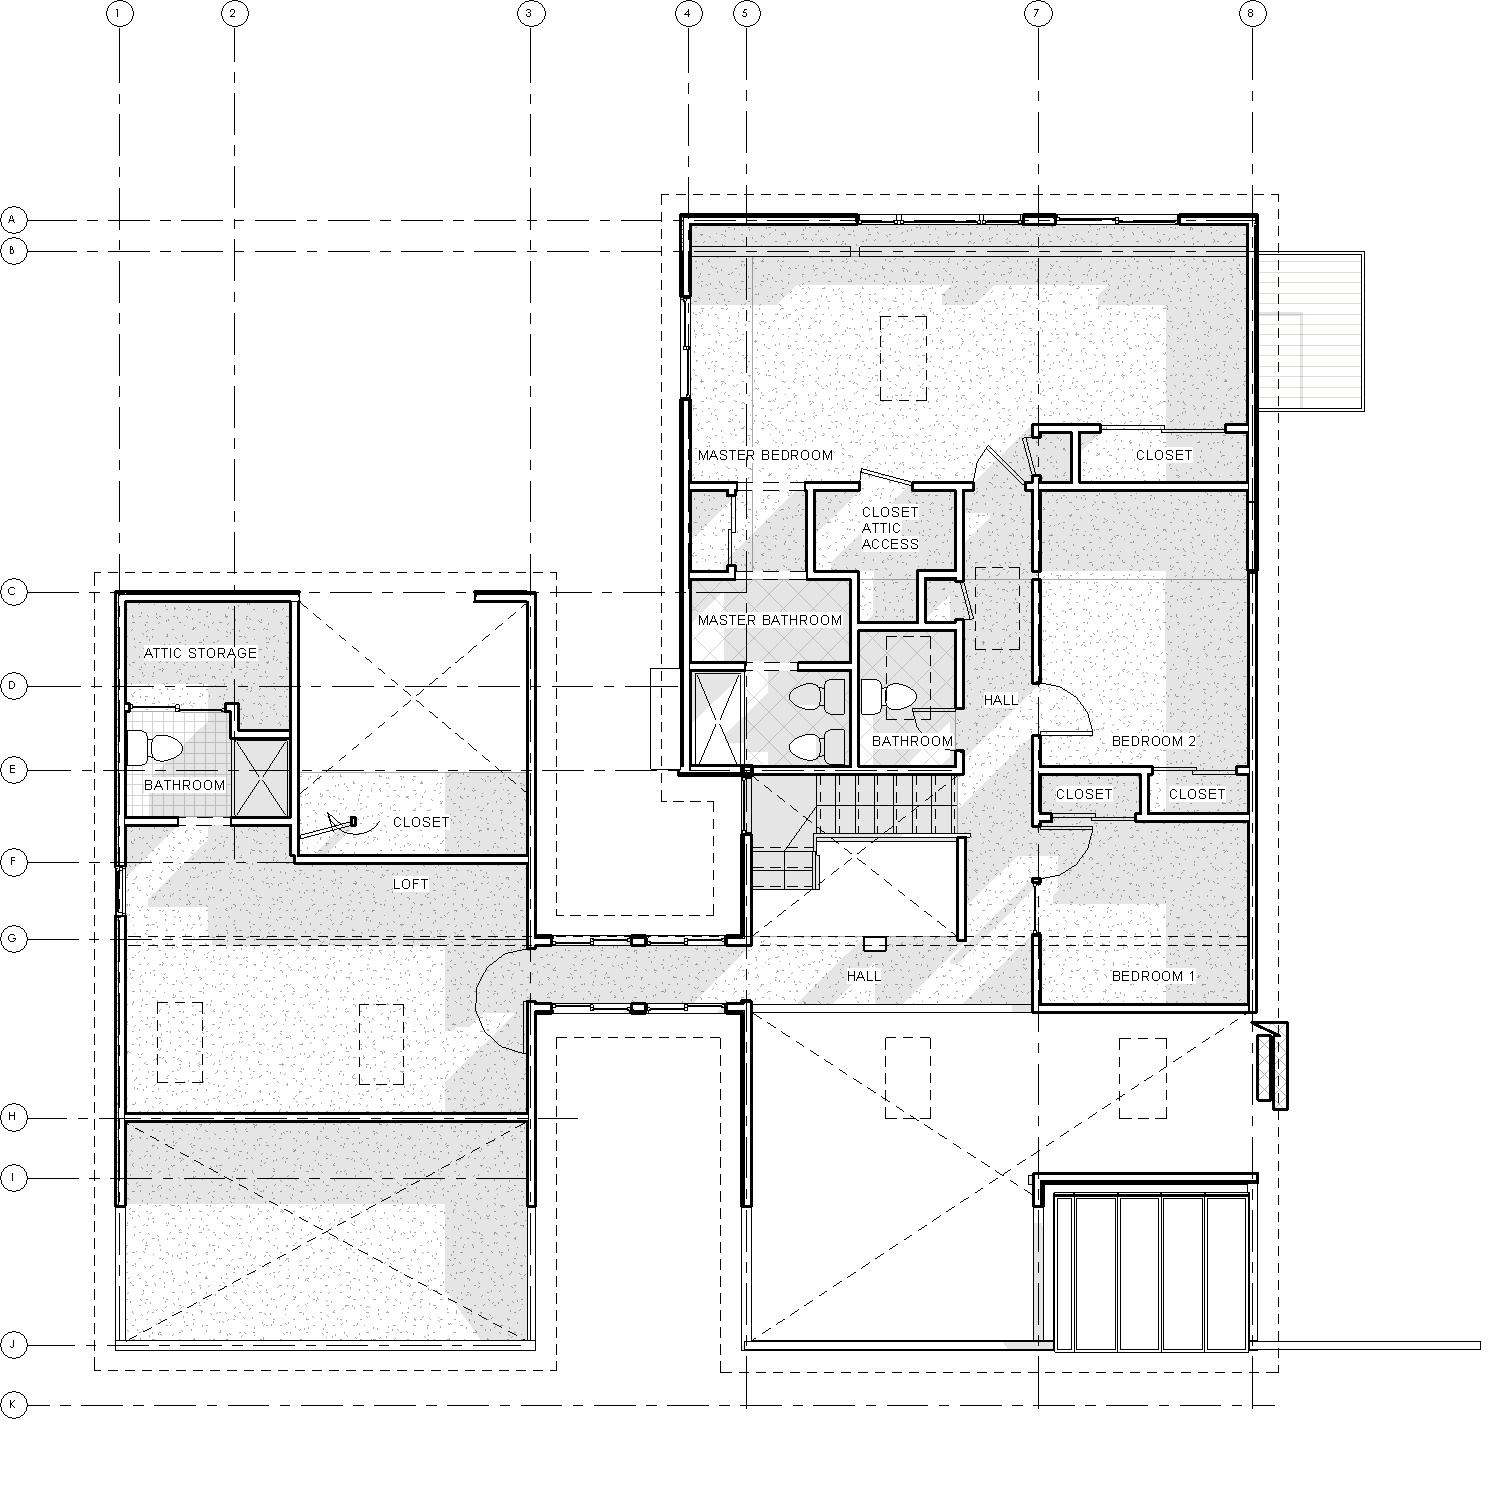 2014-03 914 Coachway_Central_09-EXISTING - Floor Plan - 2nd Floor Existing.jpg